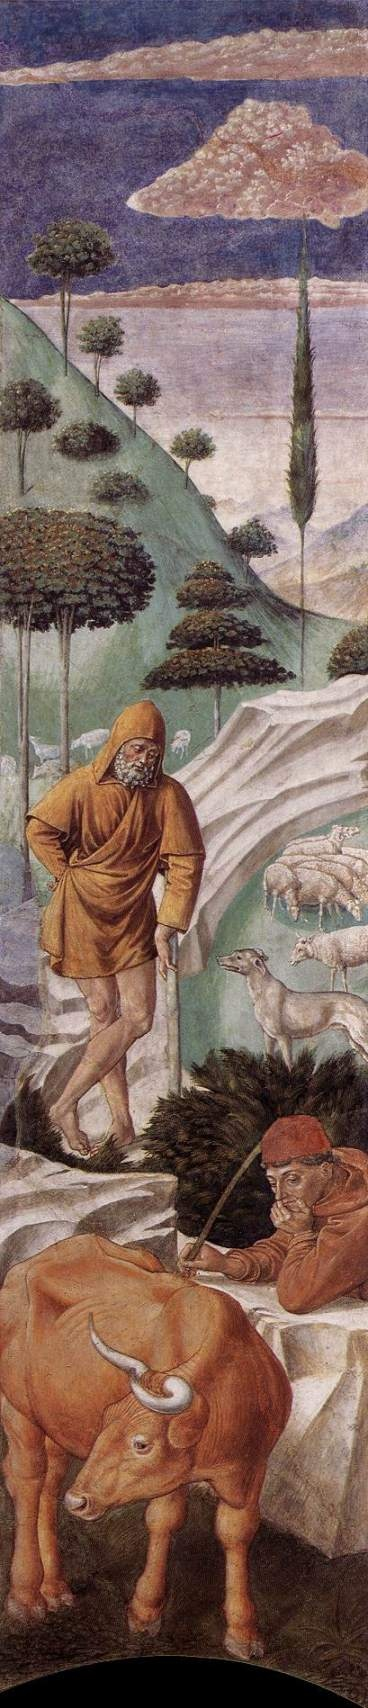 Vigil of the Shepherds, 1459-61, by Benozzo Gozzoli (1421–1497). Fresco in the Palazzo Medici-Riccardi, Florence, Italy